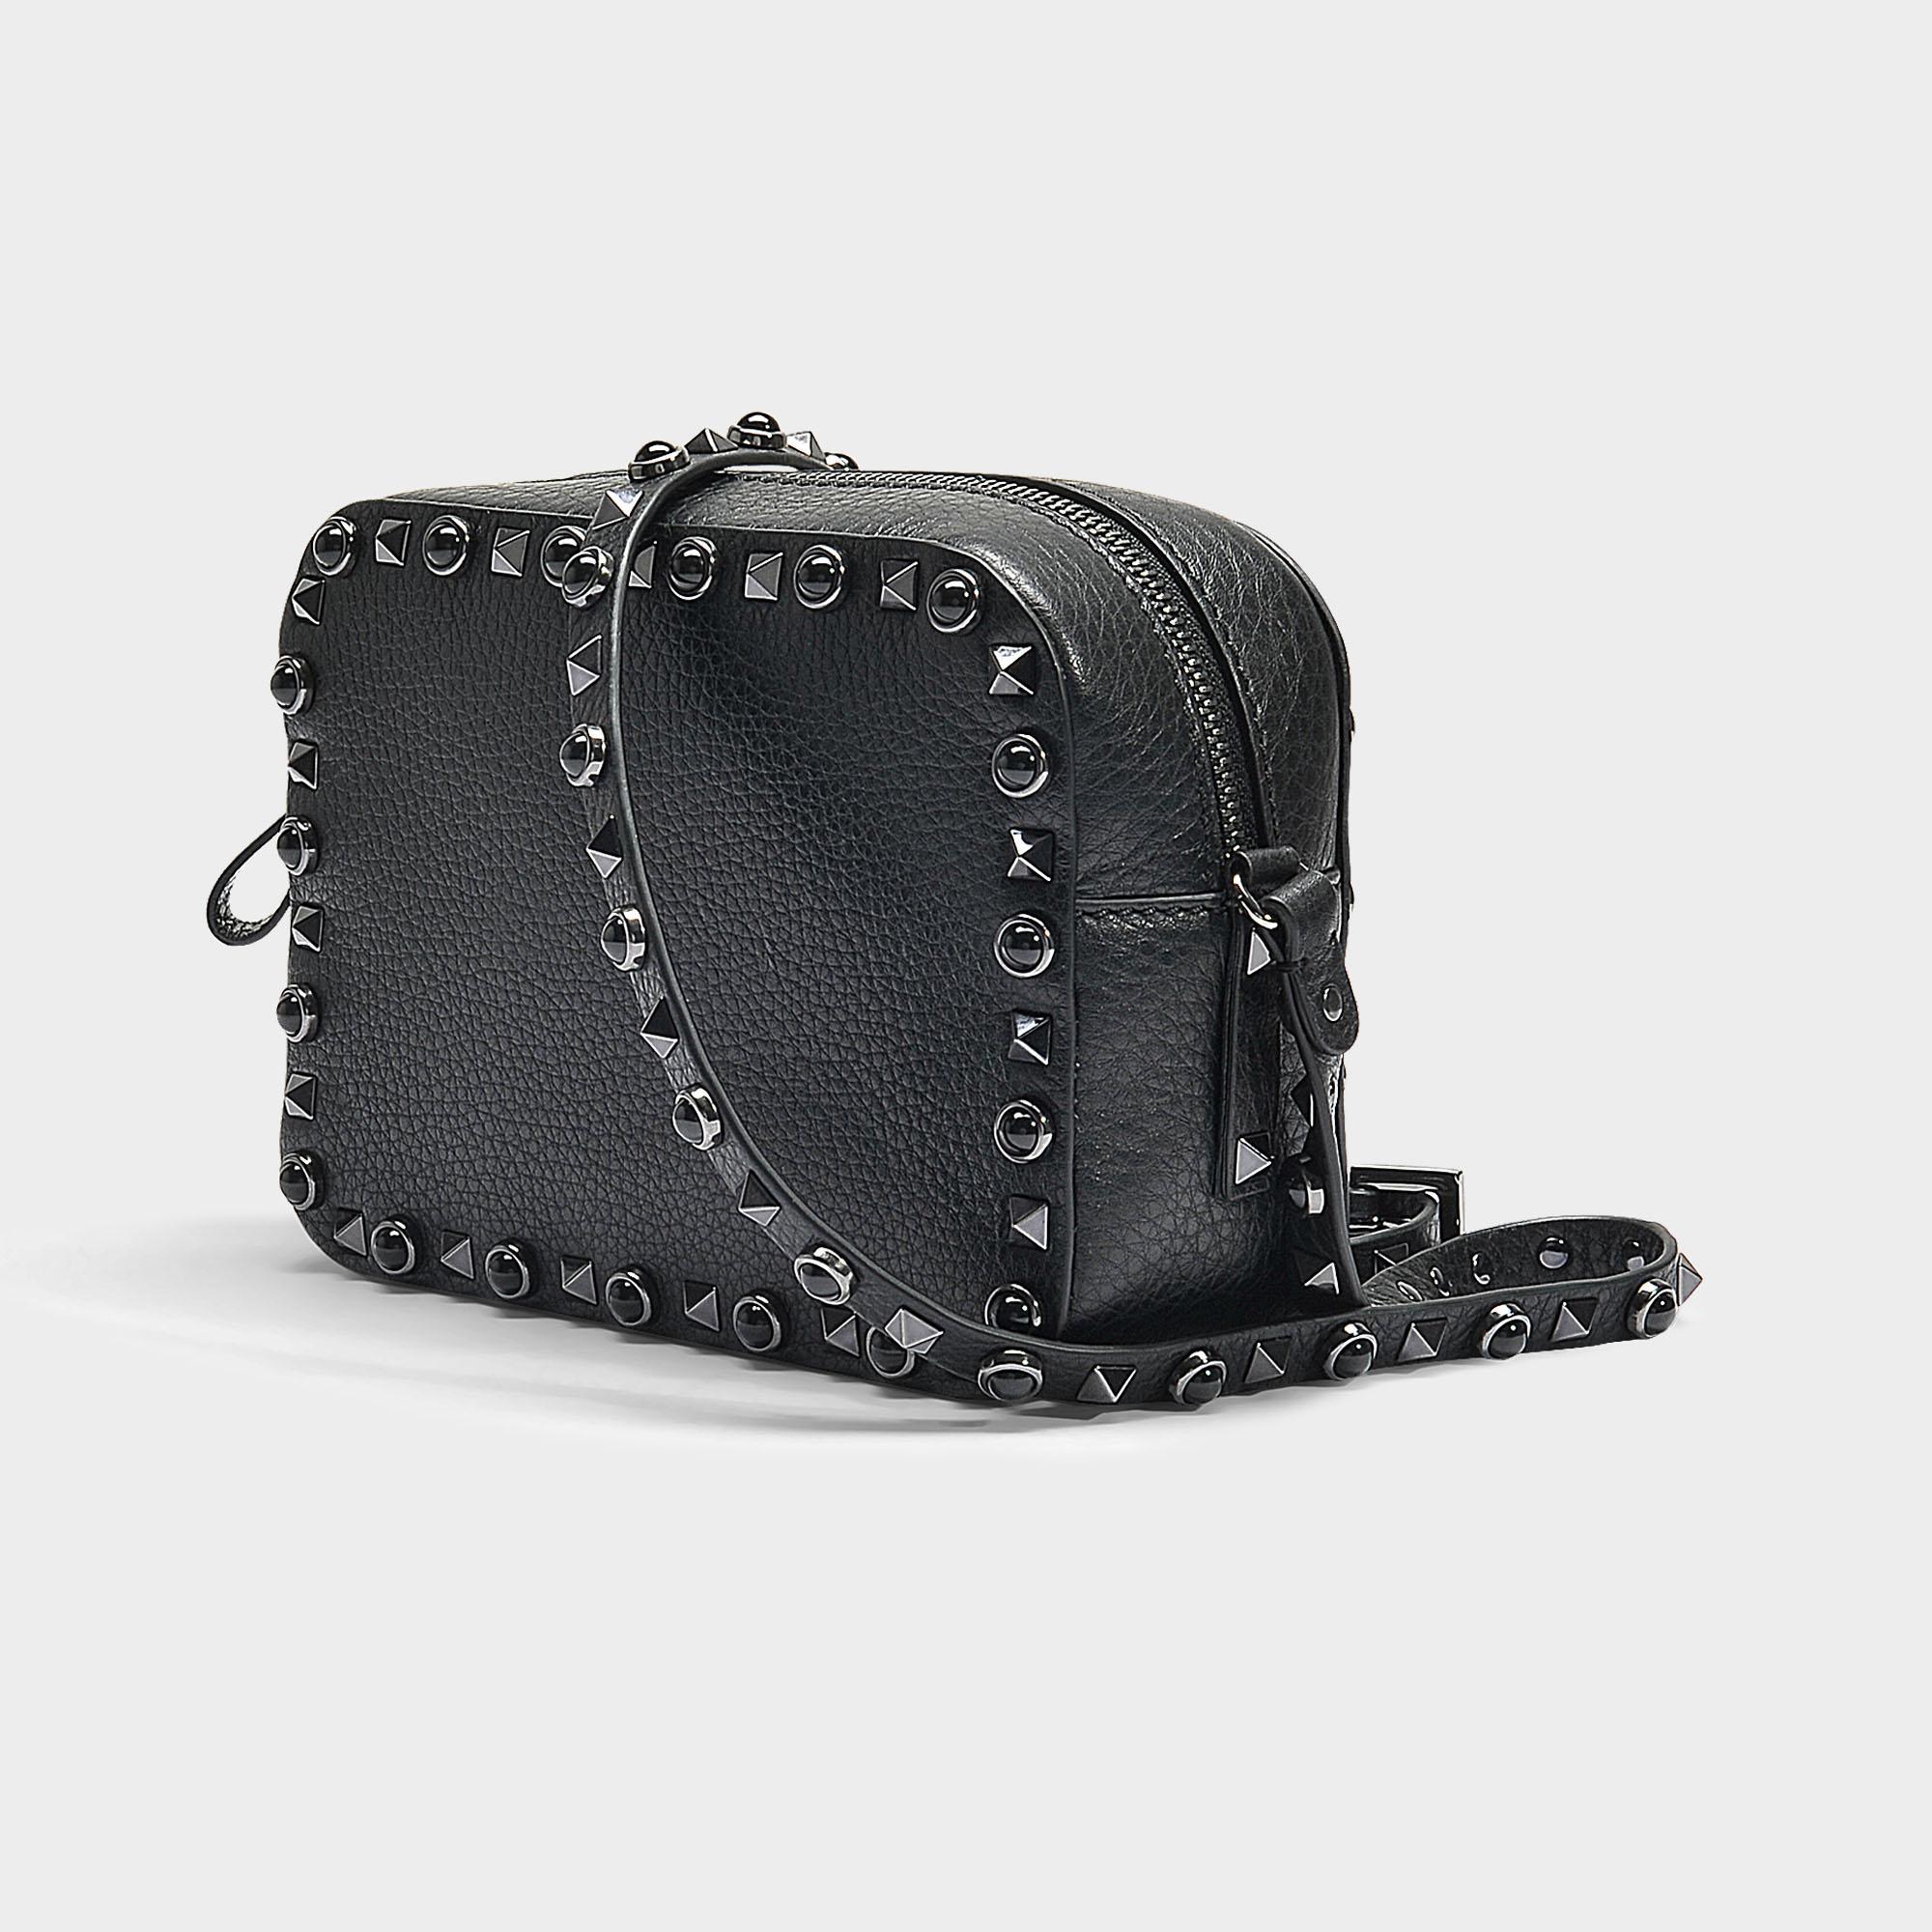 e787c5c3d7e0 Valentino - Rolling Rockstud Camera Bag In Black Grained Calfskin - Lyst.  View fullscreen